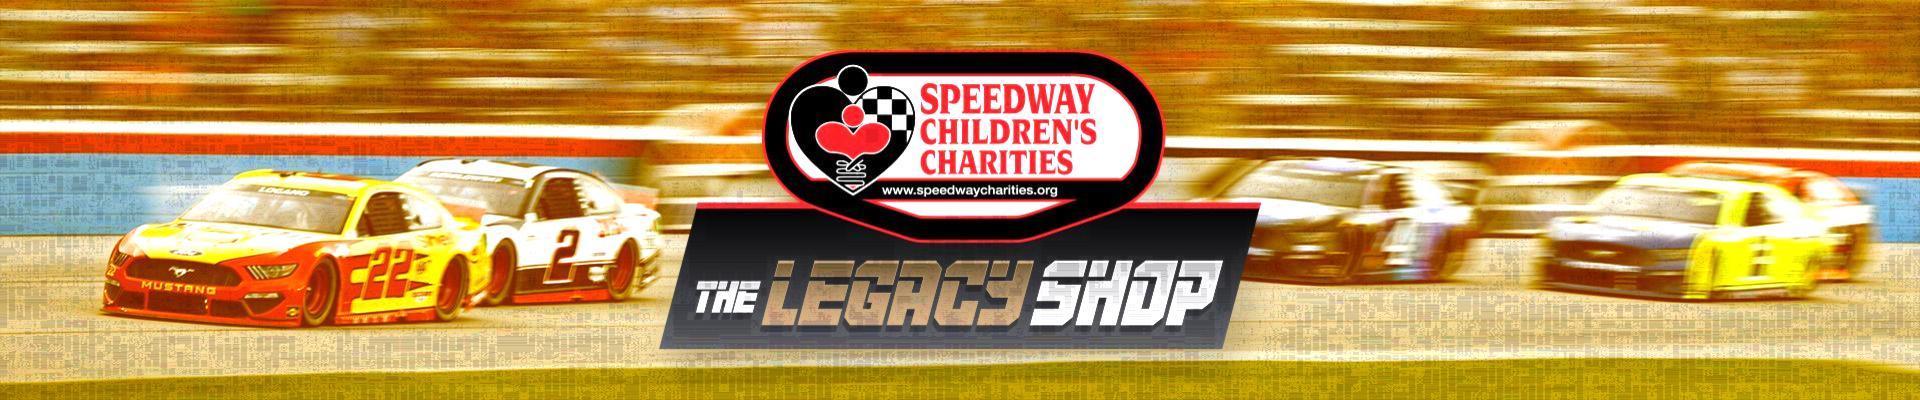 The Legacy Shop Header